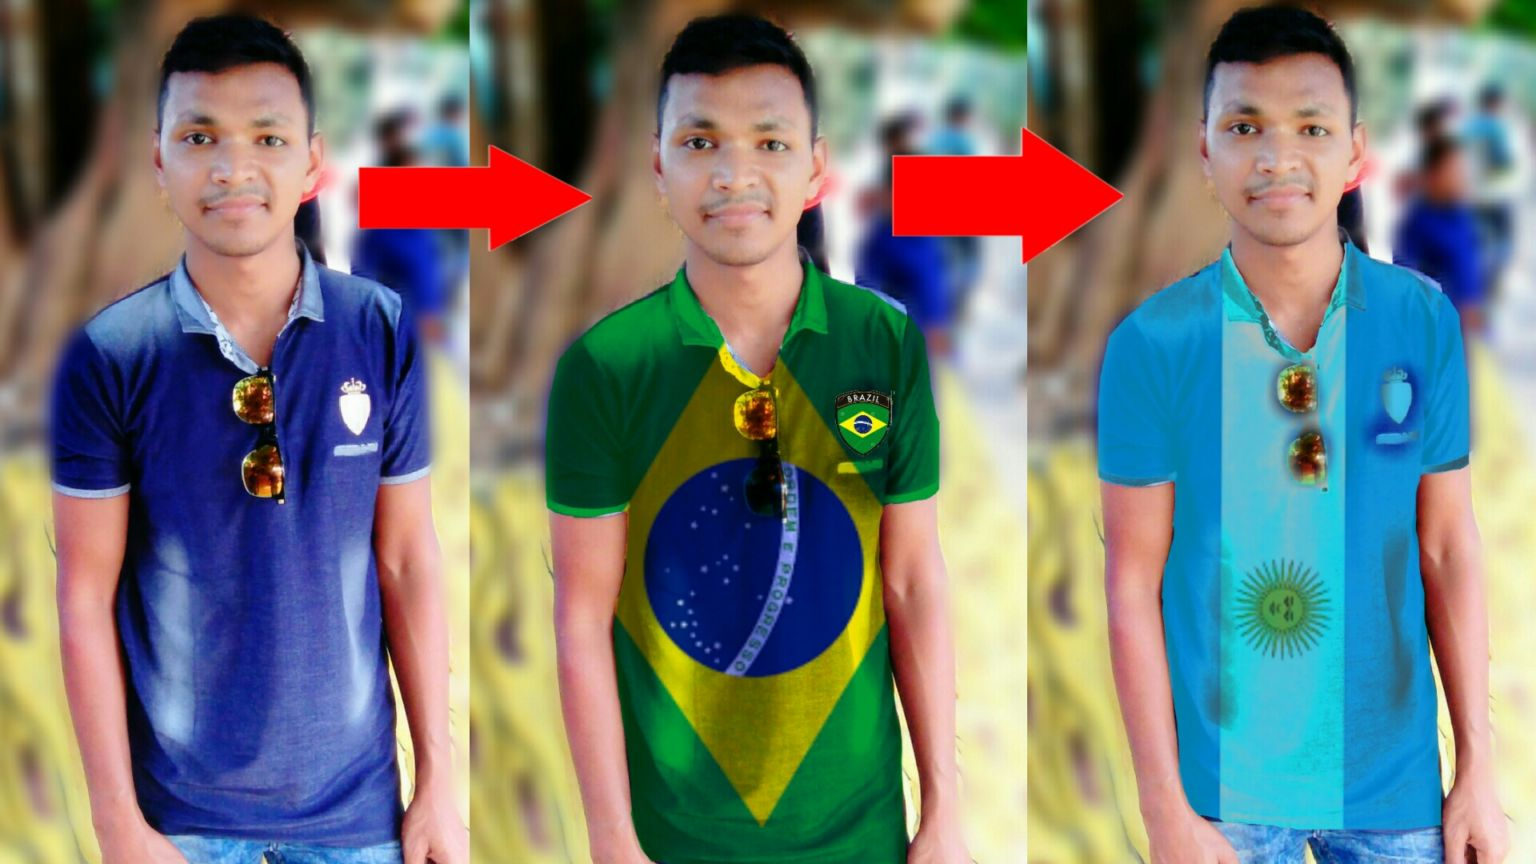 [Football Lovers Don't Miss] প্রিয় ফুটবল দল এর পতাকা ও কোনো ছবি ও নিজের Tshirt  বানিয়ে নিন Adndroid  phone দিয়ে। Picsart Editing  Like photoshop